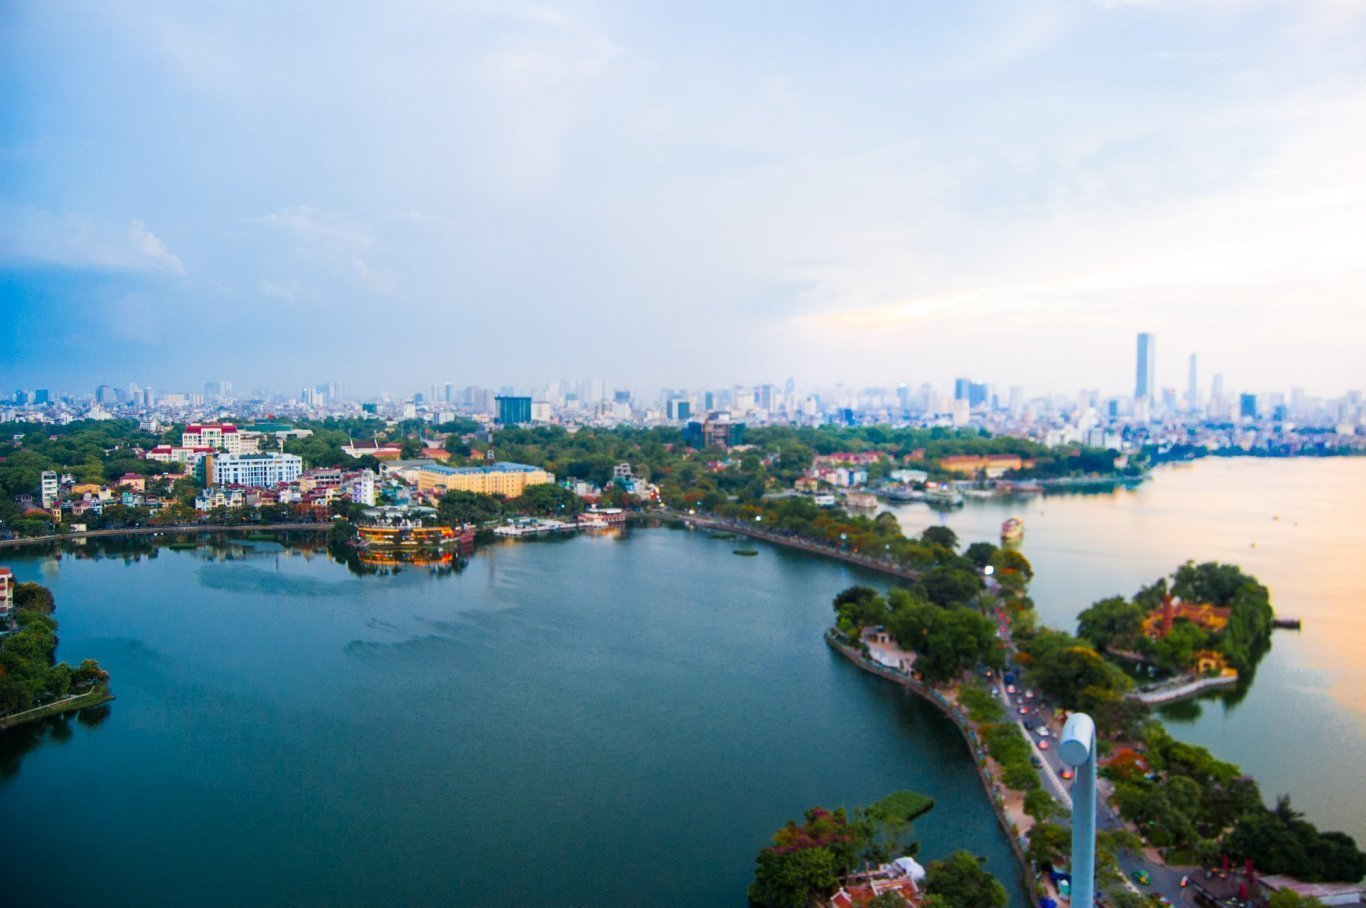 15-Day Wonderful North and South Vietnam - Vietnam Itinerary